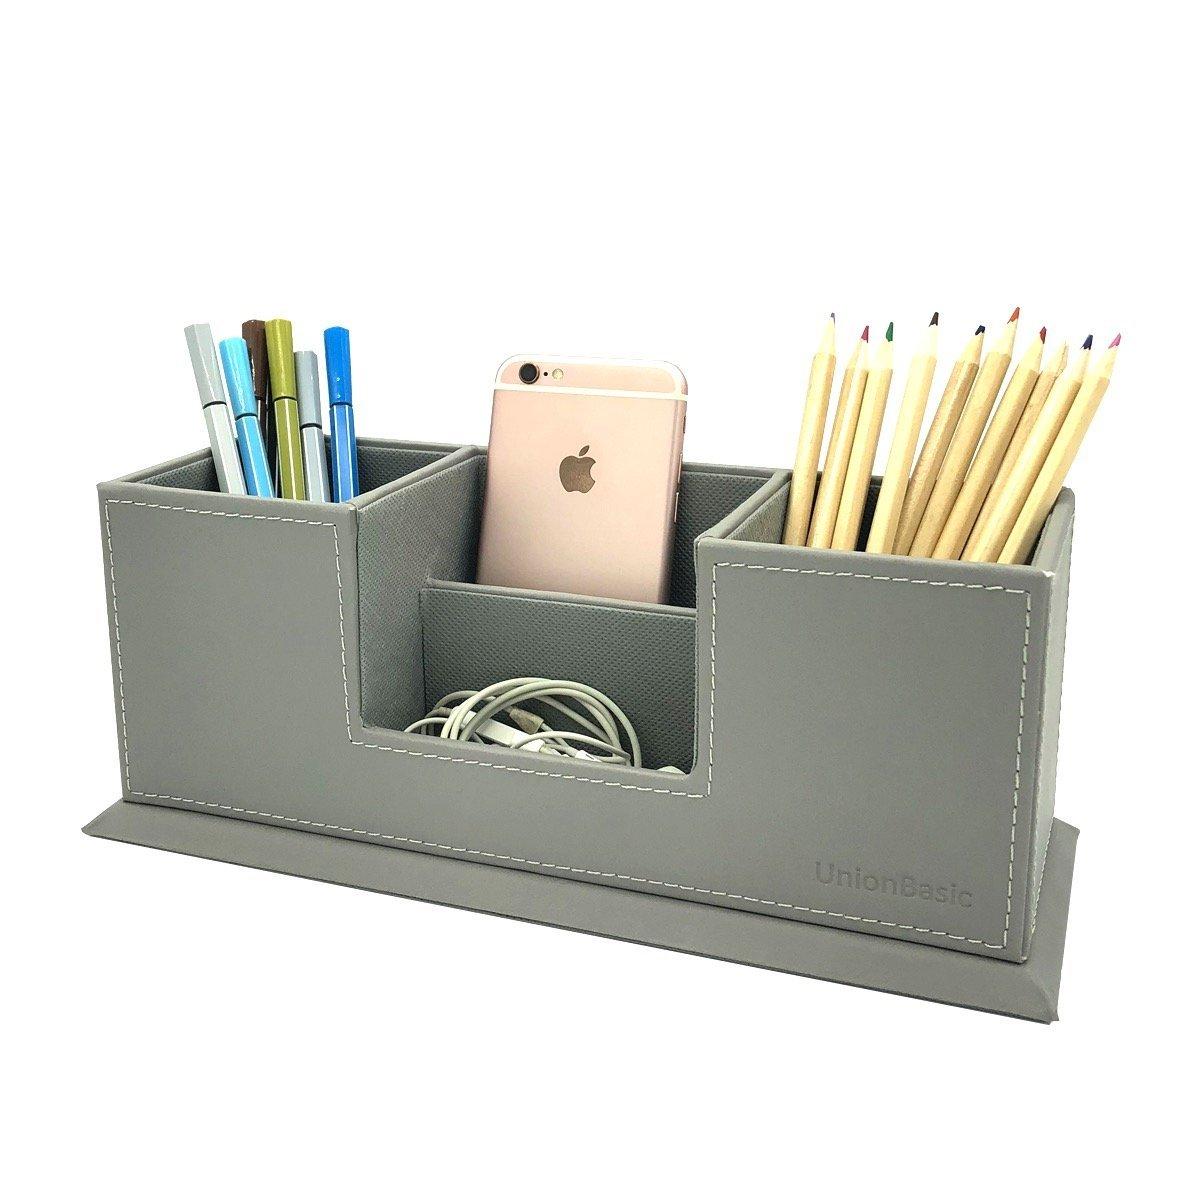 UnionBasic PU Leather 4 Compartment Desk Organizer Card/Pen/Pencil/Mobile Phone Office Supplies Holder Collection Desktop Organizer (Grey)